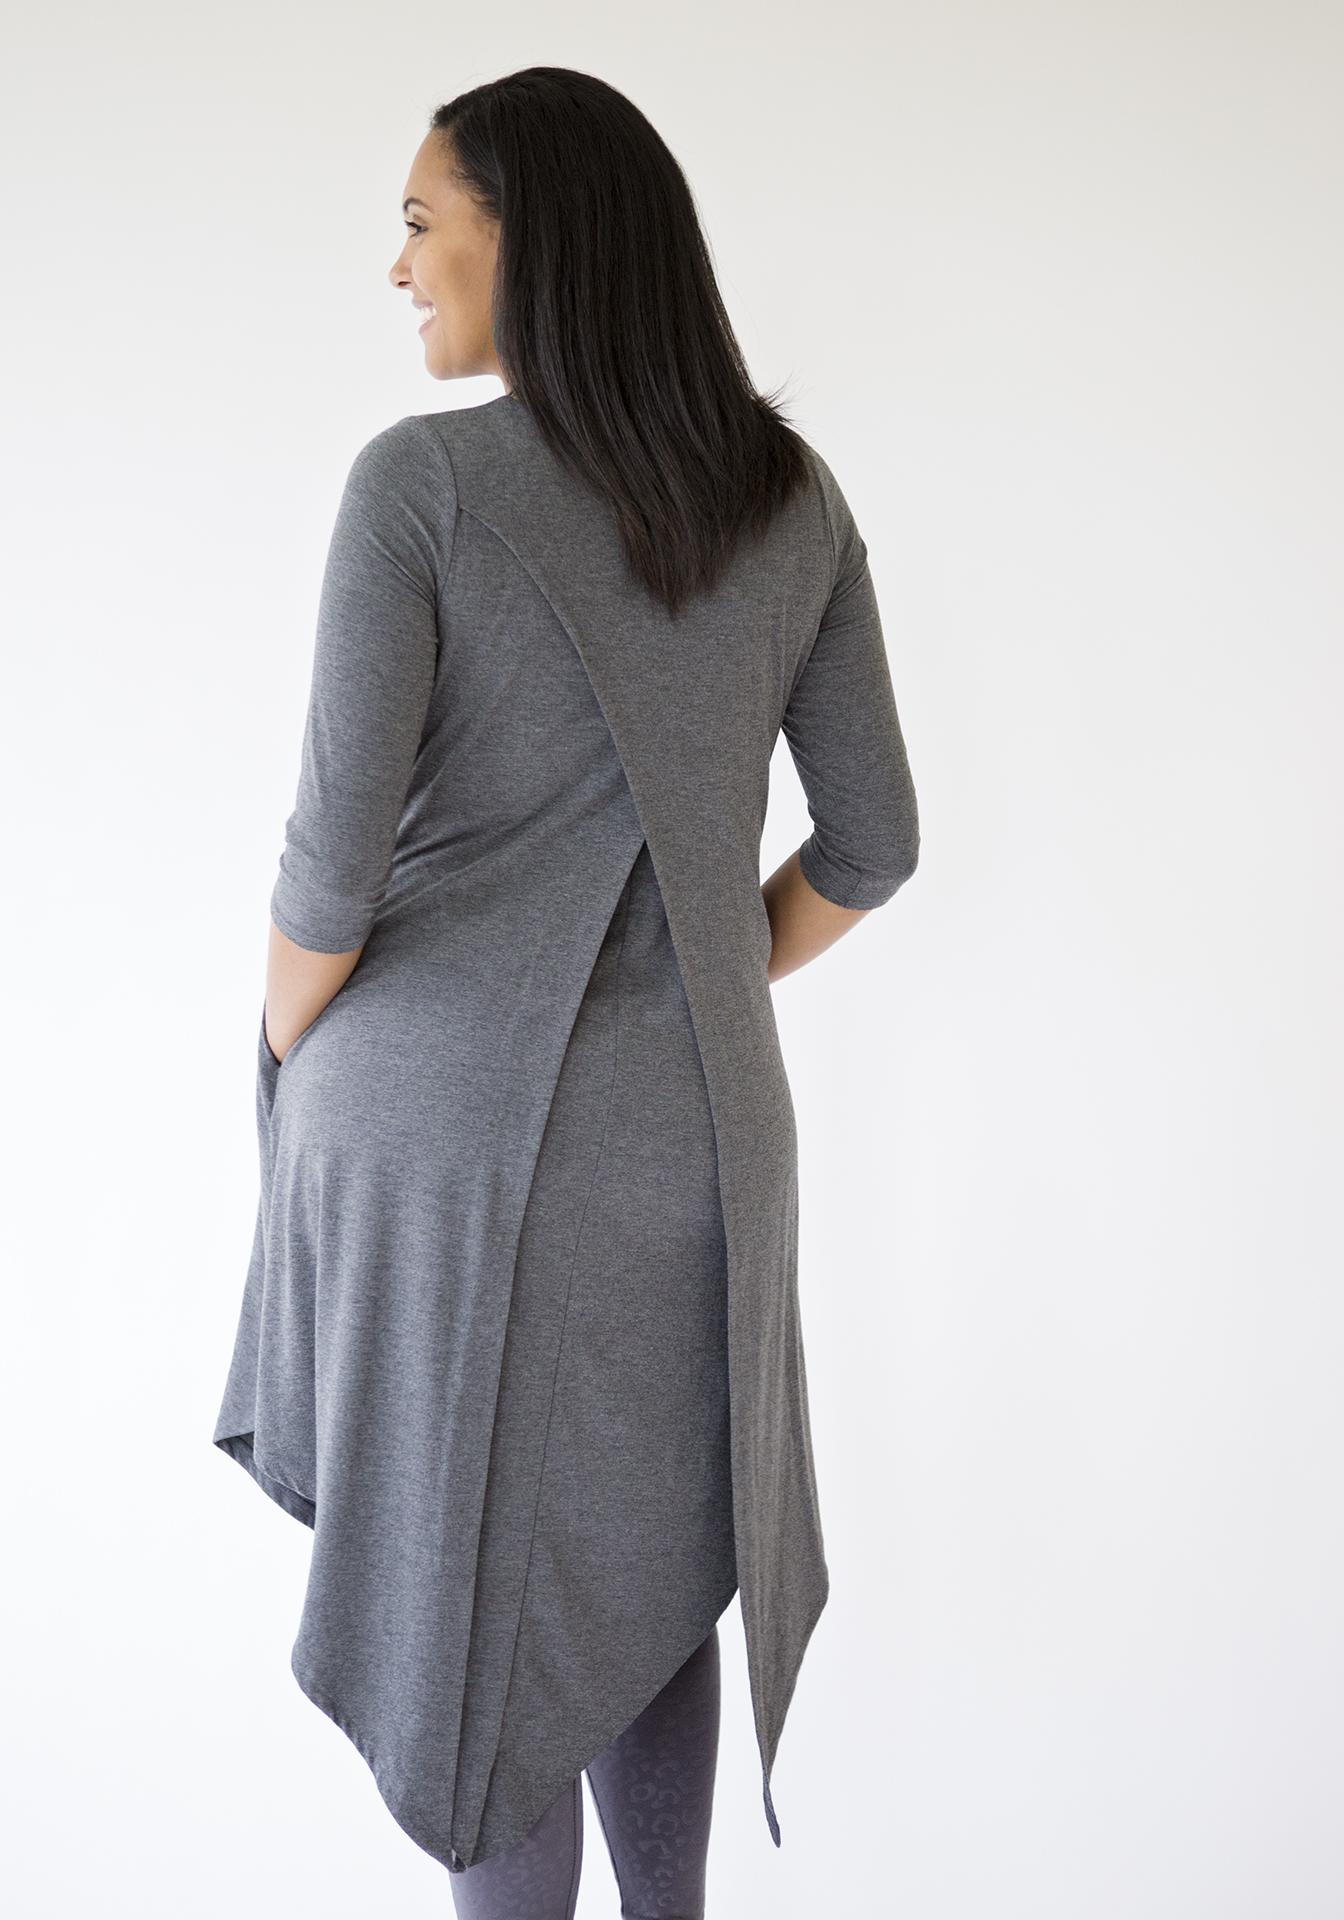 Minerva Dress